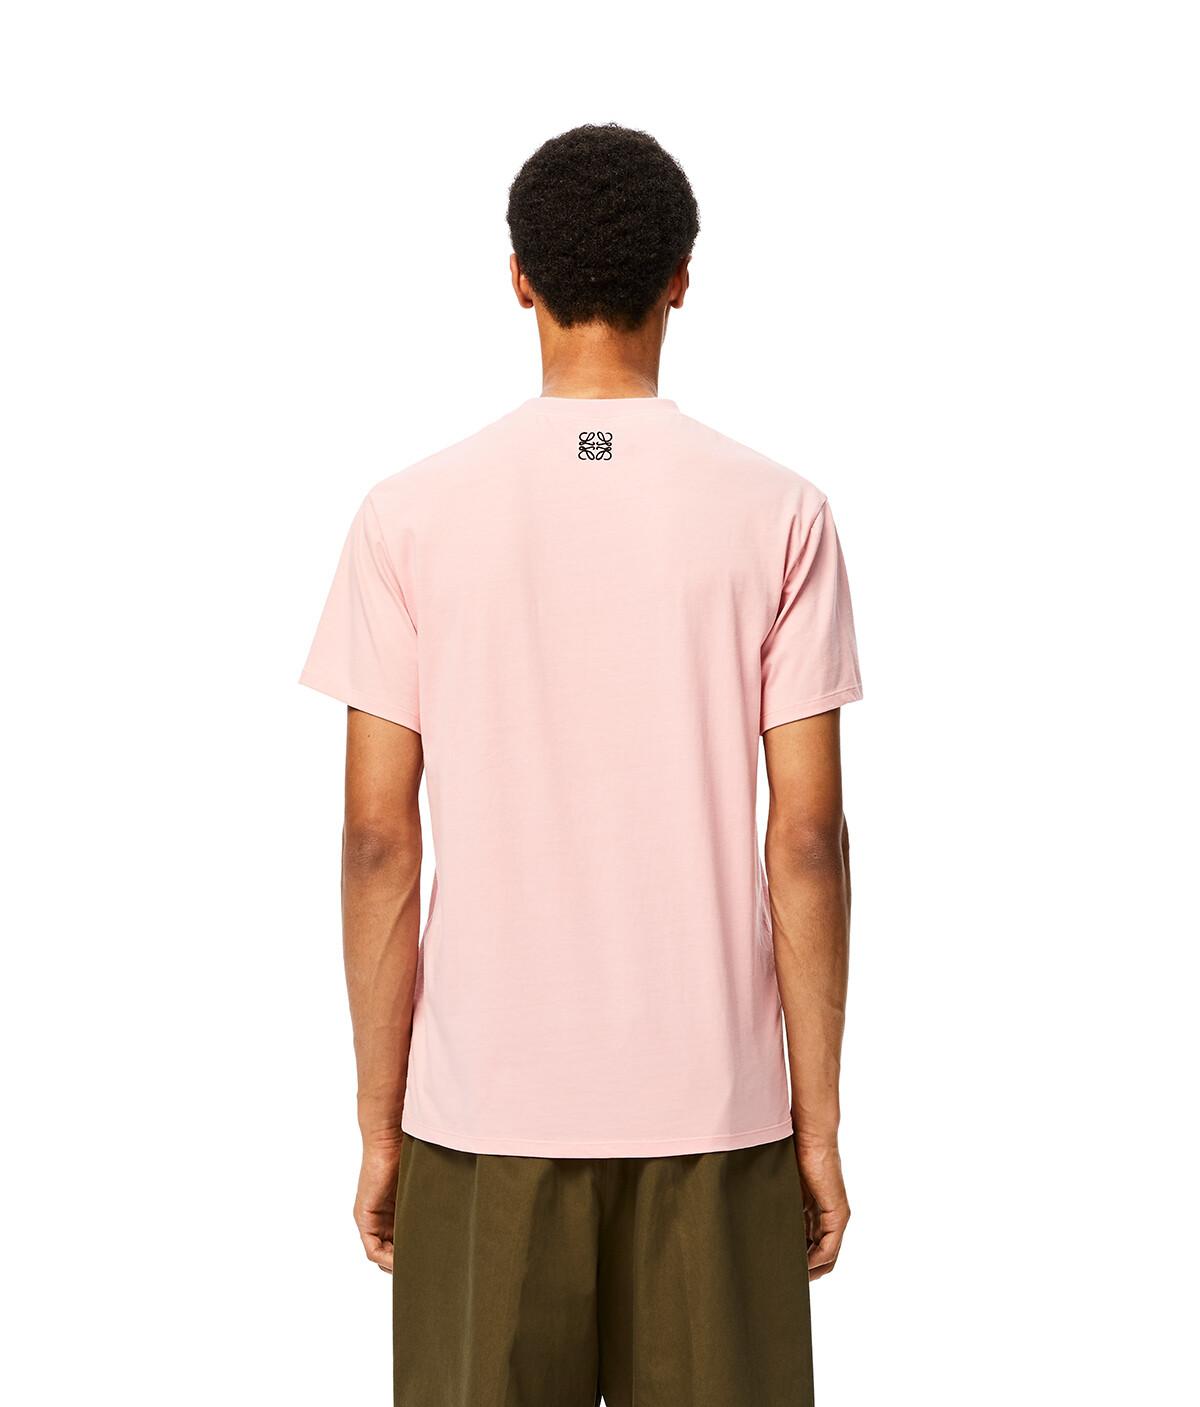 LOEWE Ken Heyman T- Shirt Rosa Bebe front